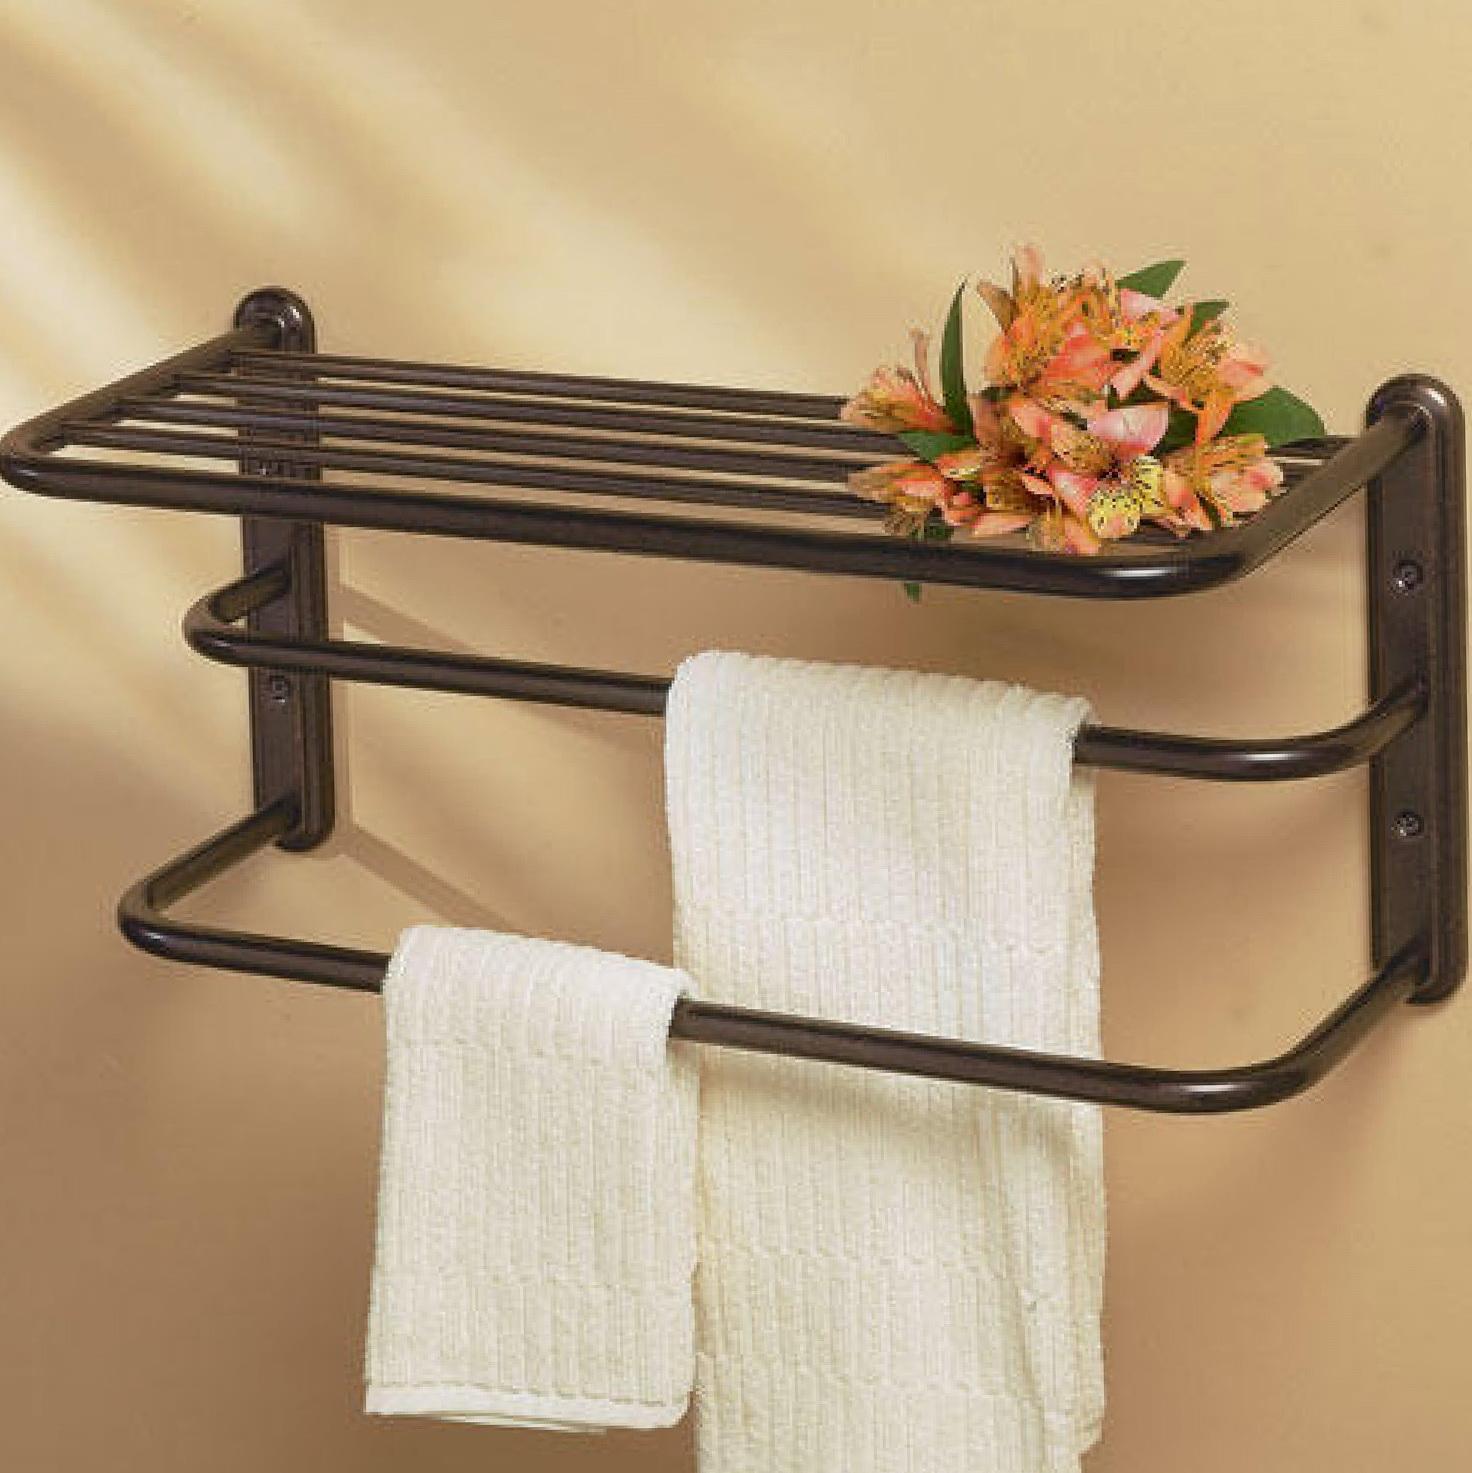 Decorative Wall Shelf With Towel Bar